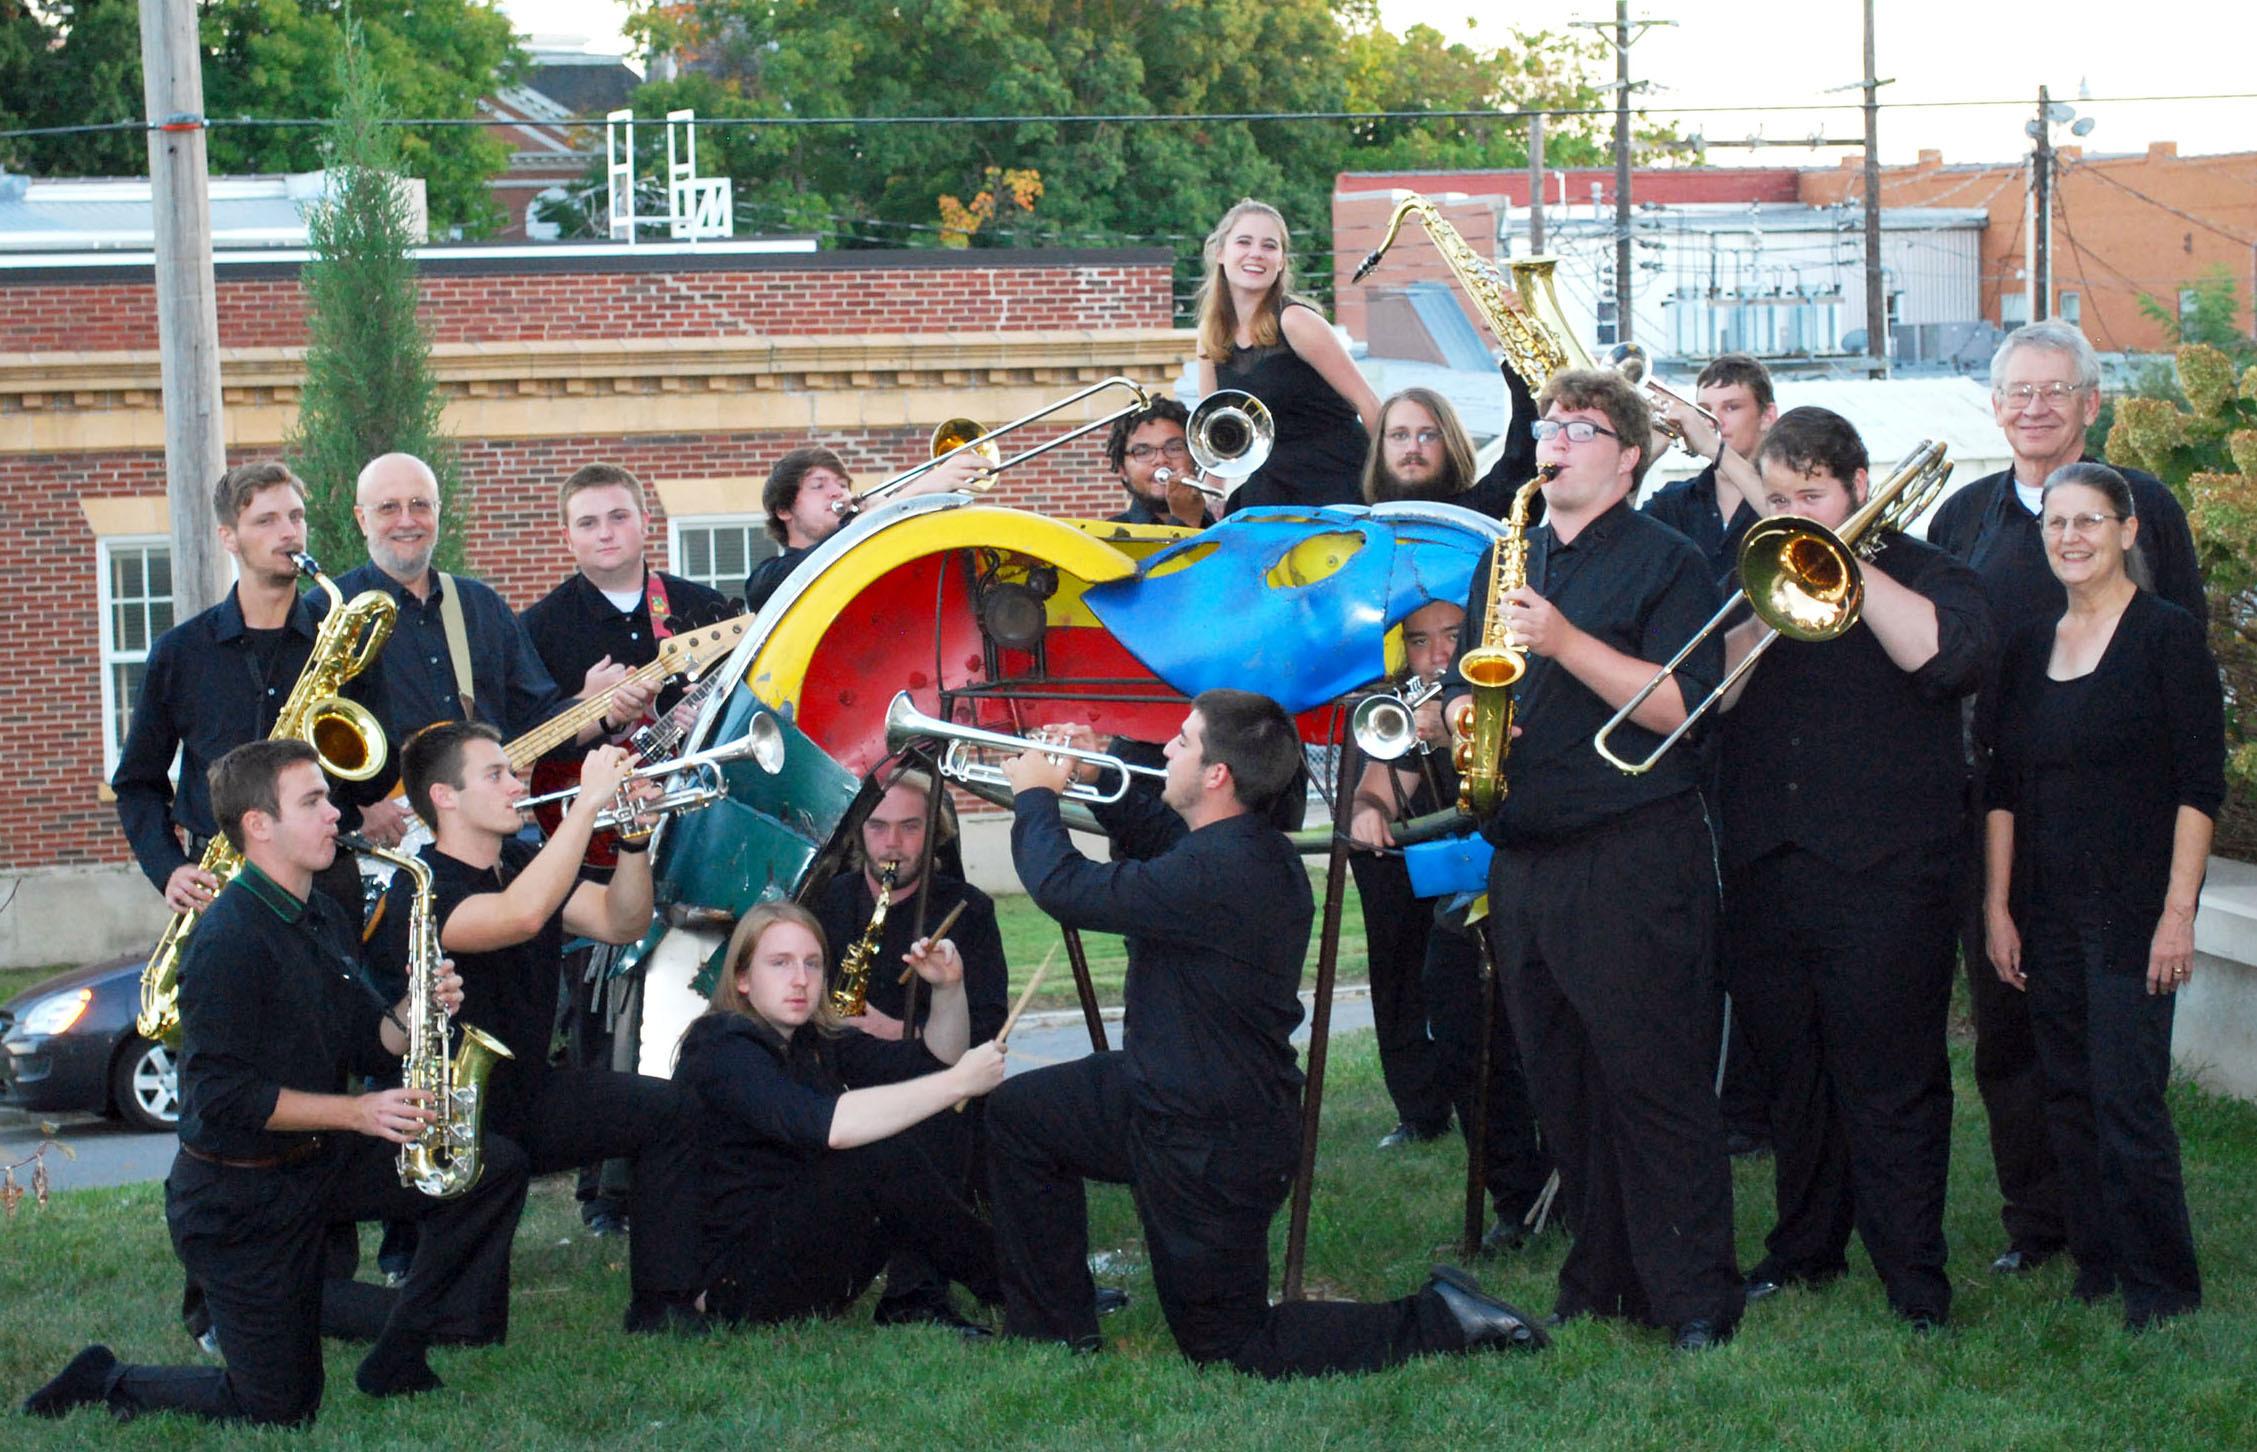 Cmu jazz band release